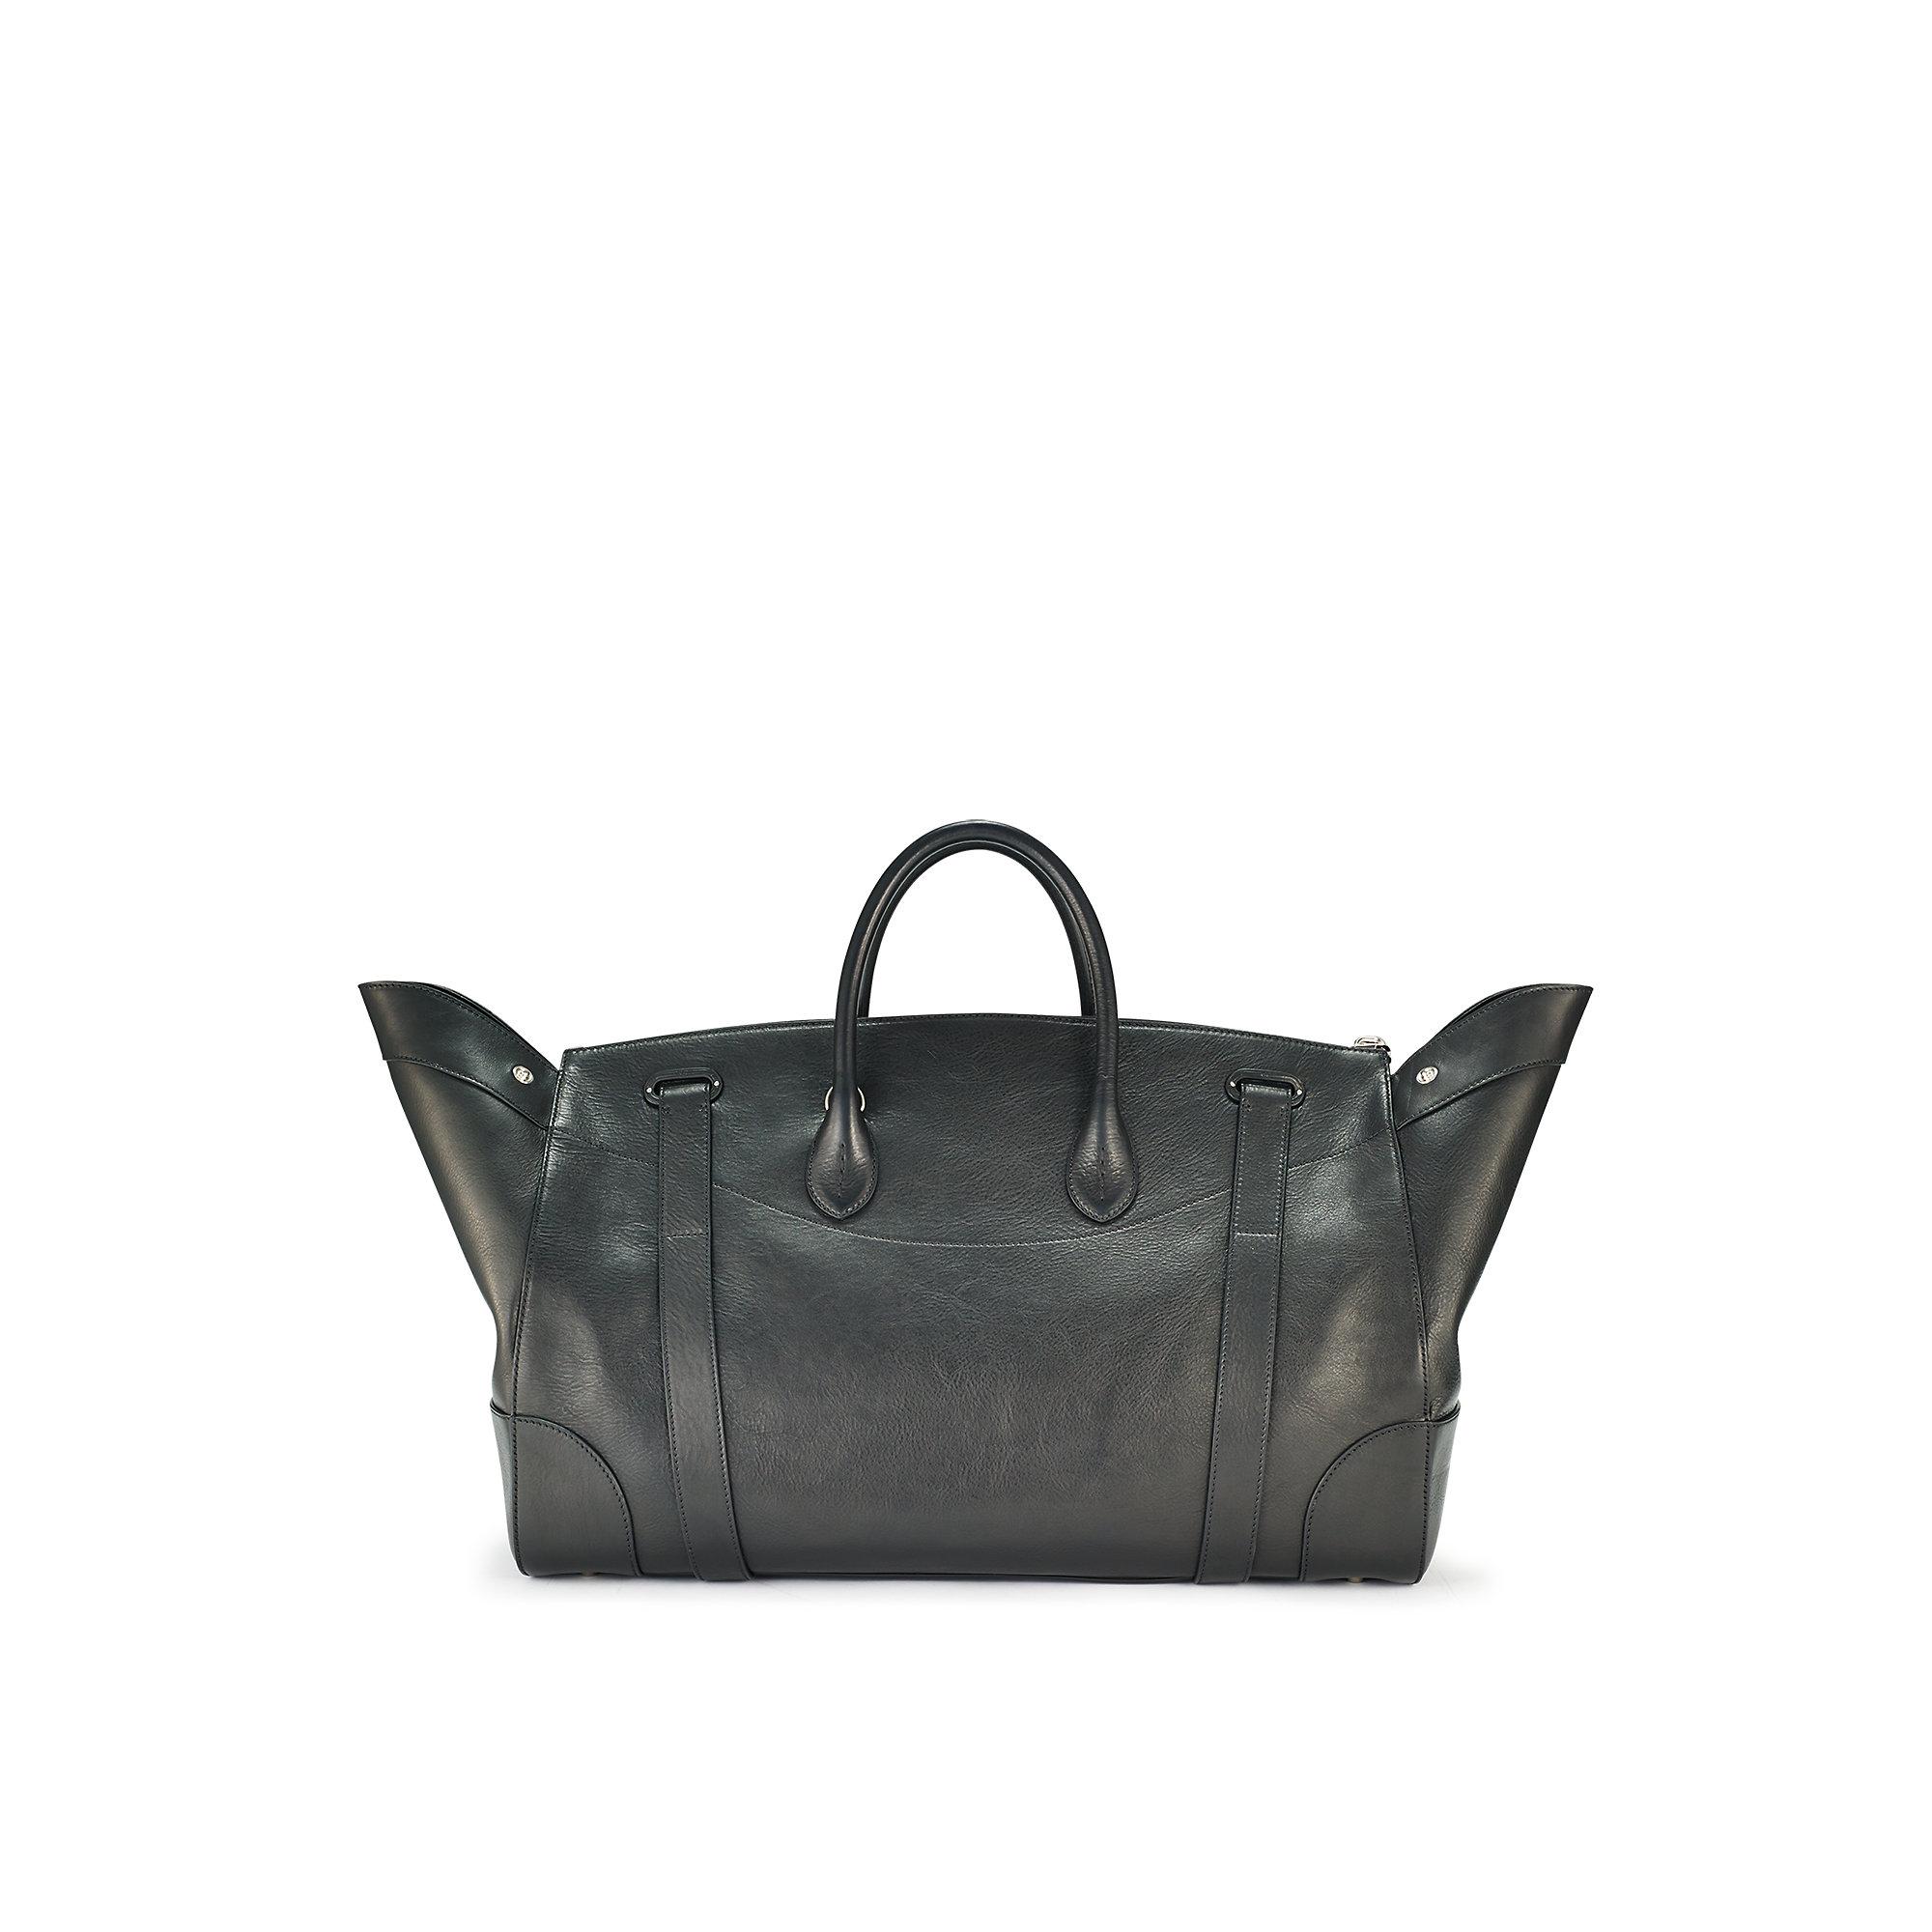 b8407d49e5 Lyst - Ralph Lauren Zipper Cooper 50 Bag in Black for Men